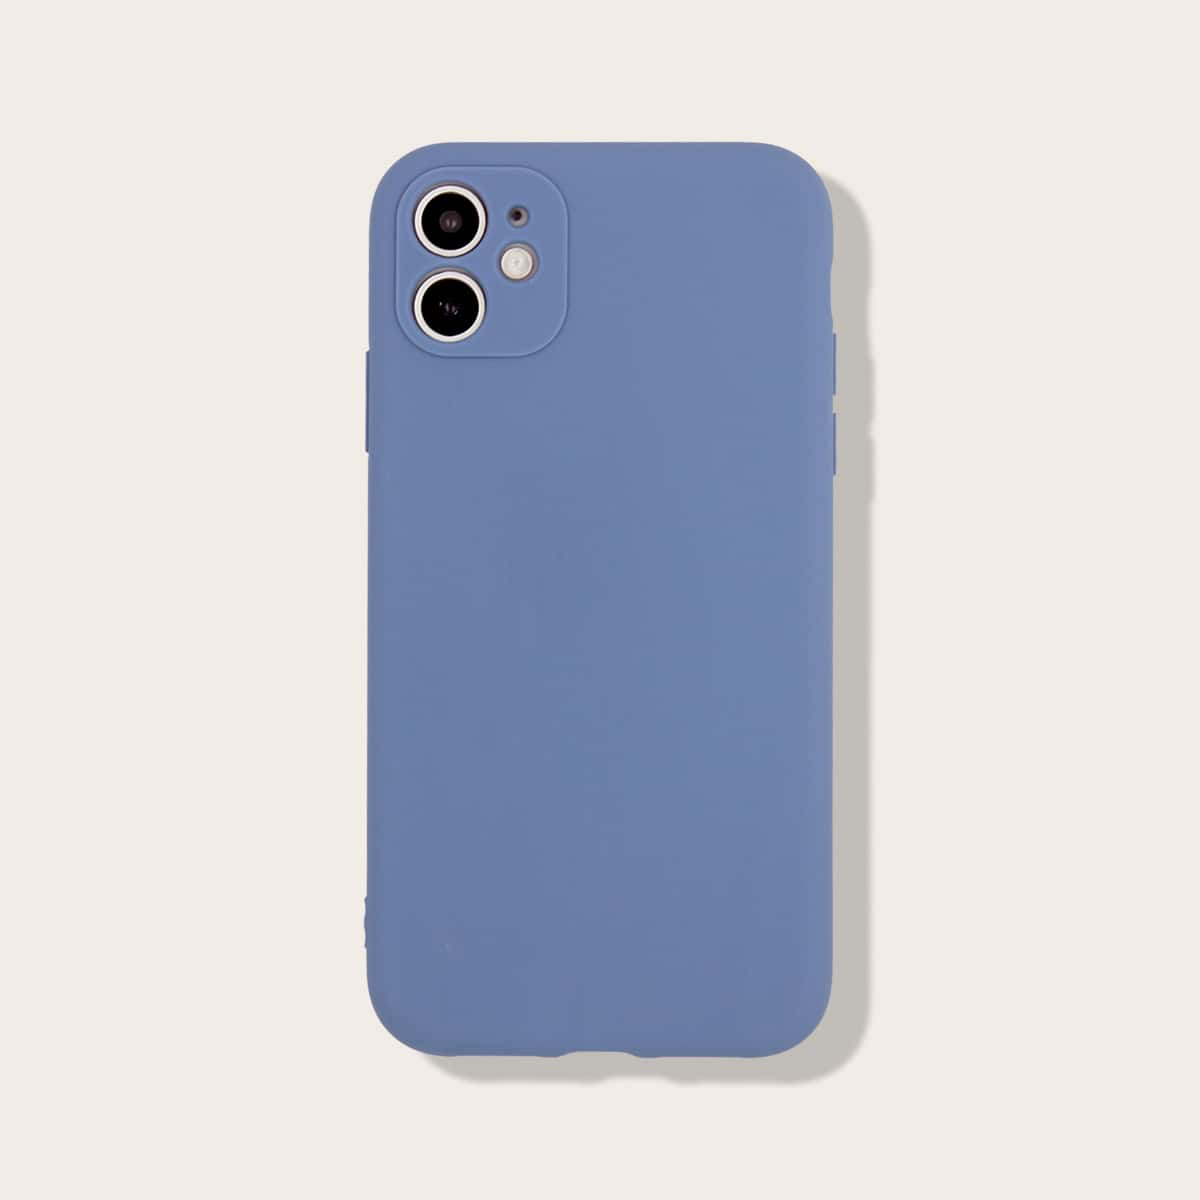 Custodia iPhone monocolore anti-caduta